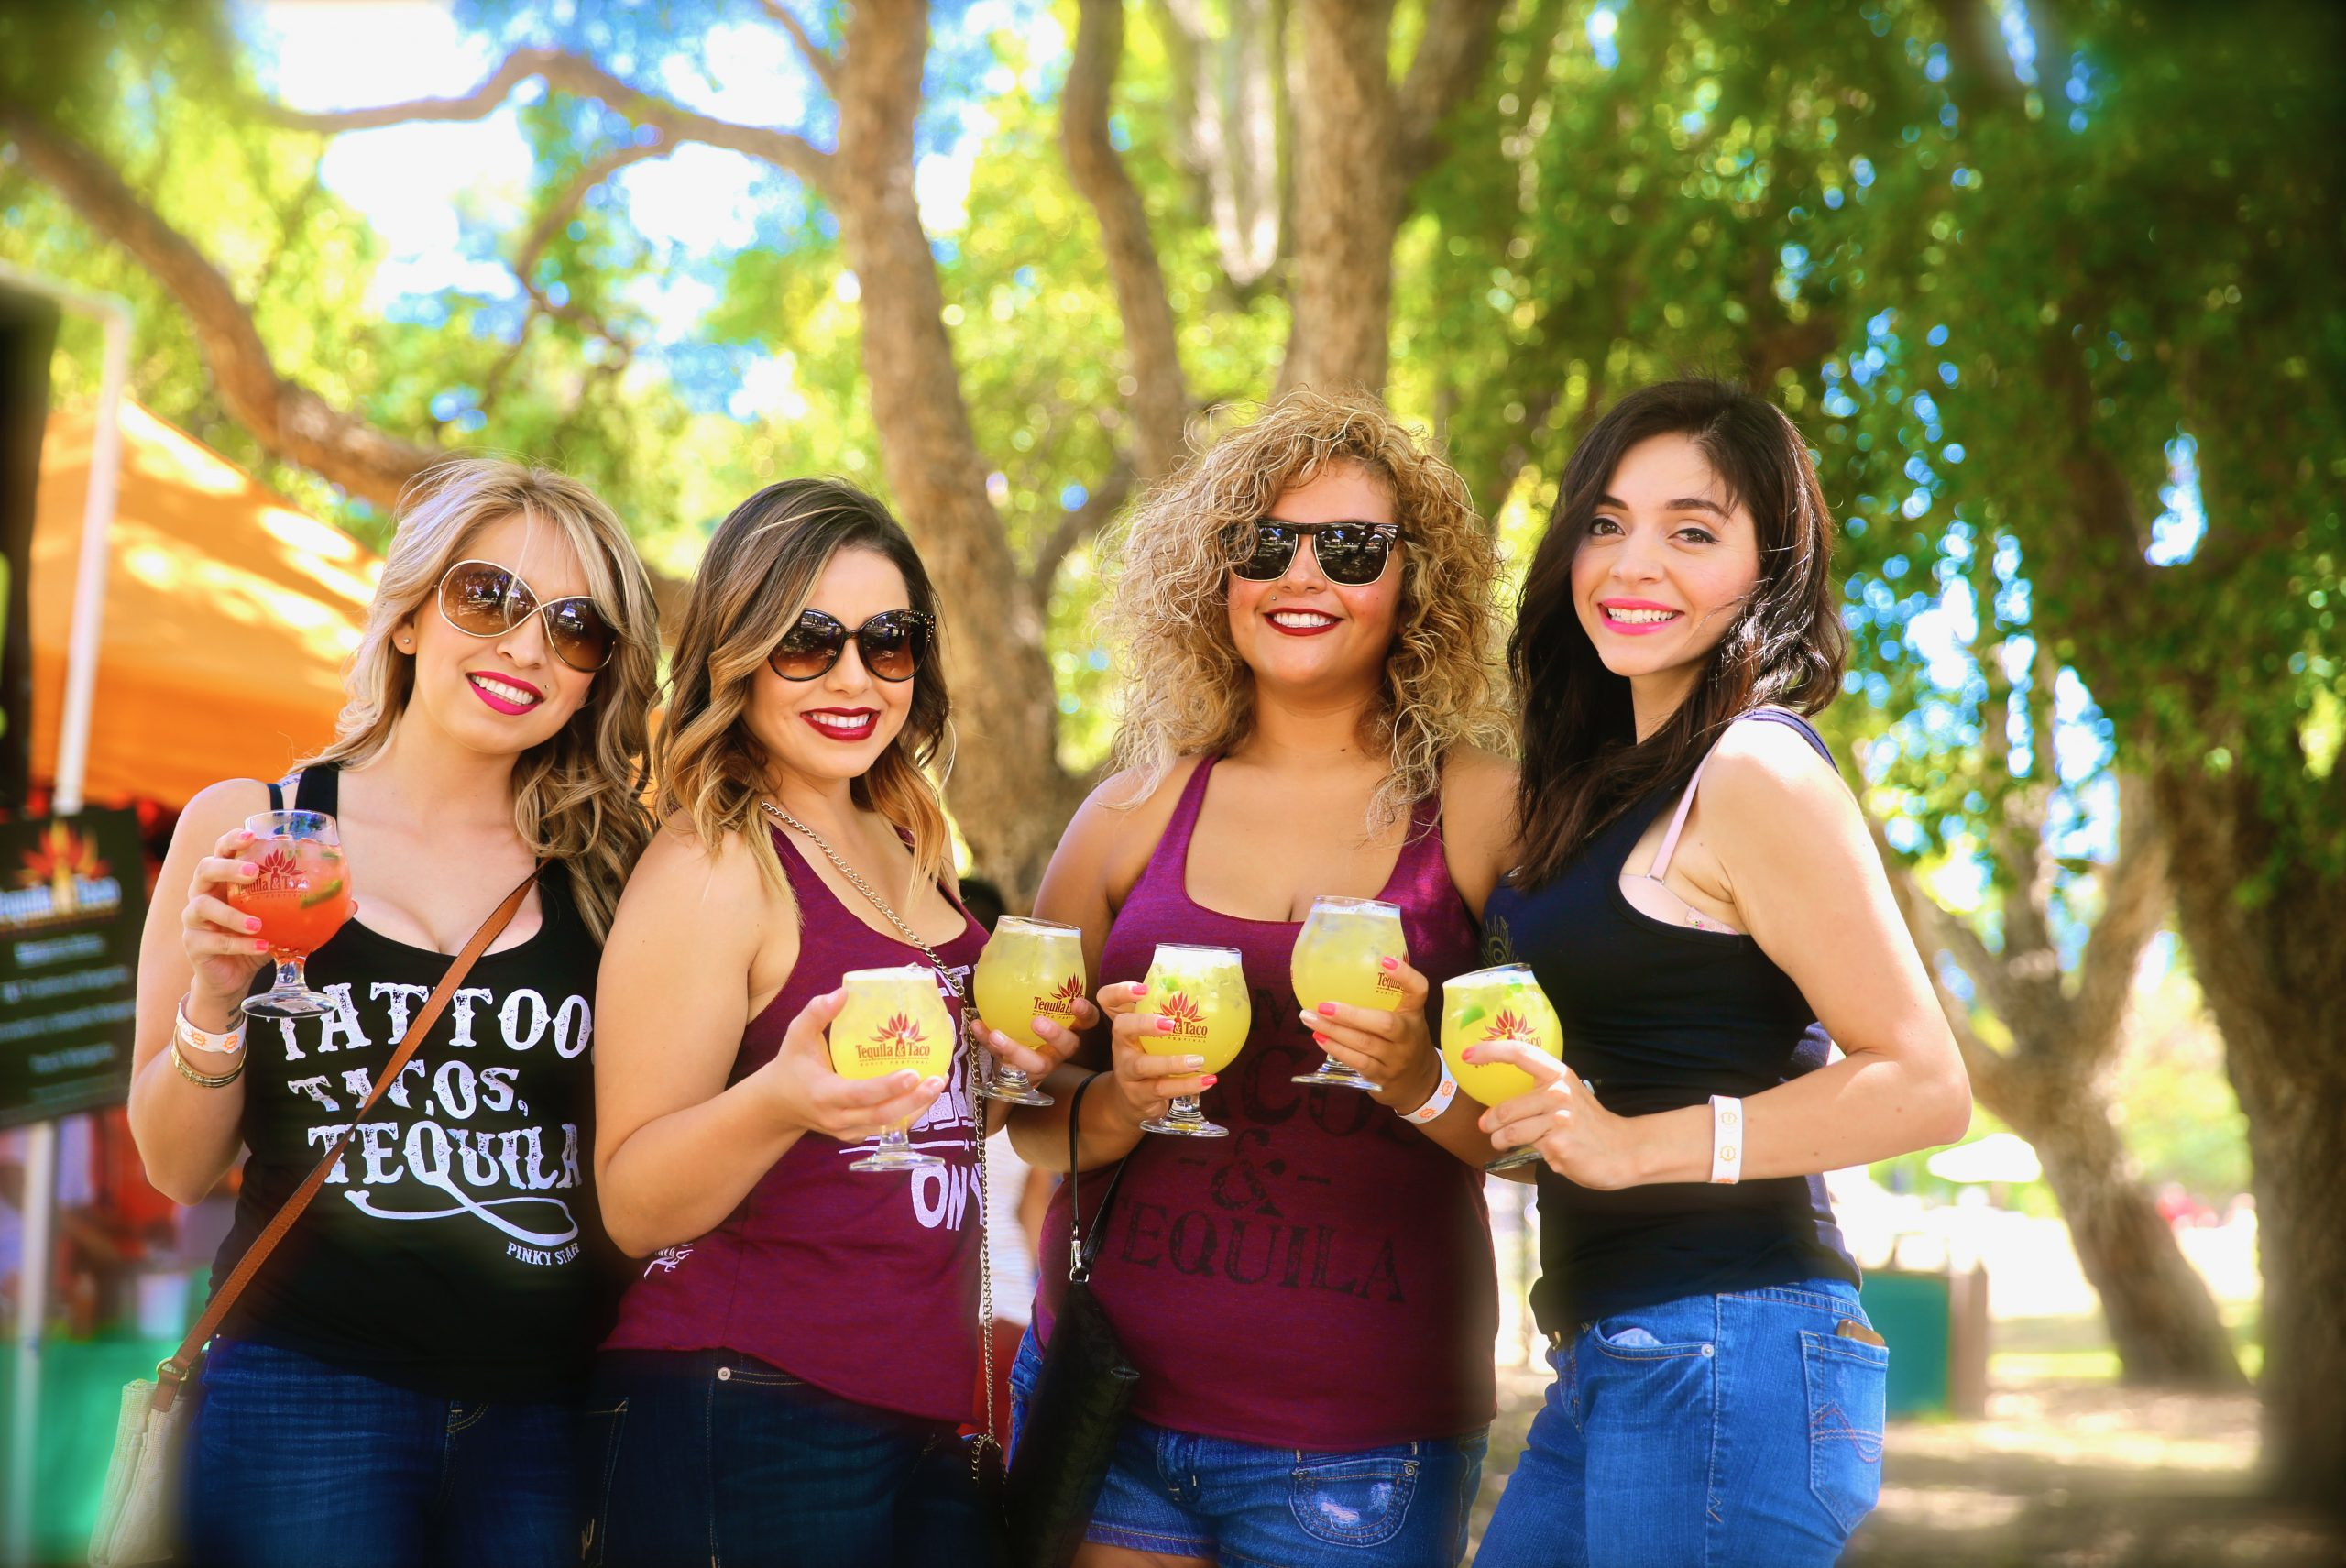 Tequila & Taco Music Festival - Saturday, April 27, 2019 Pertaining To San Diego Music Calendar April